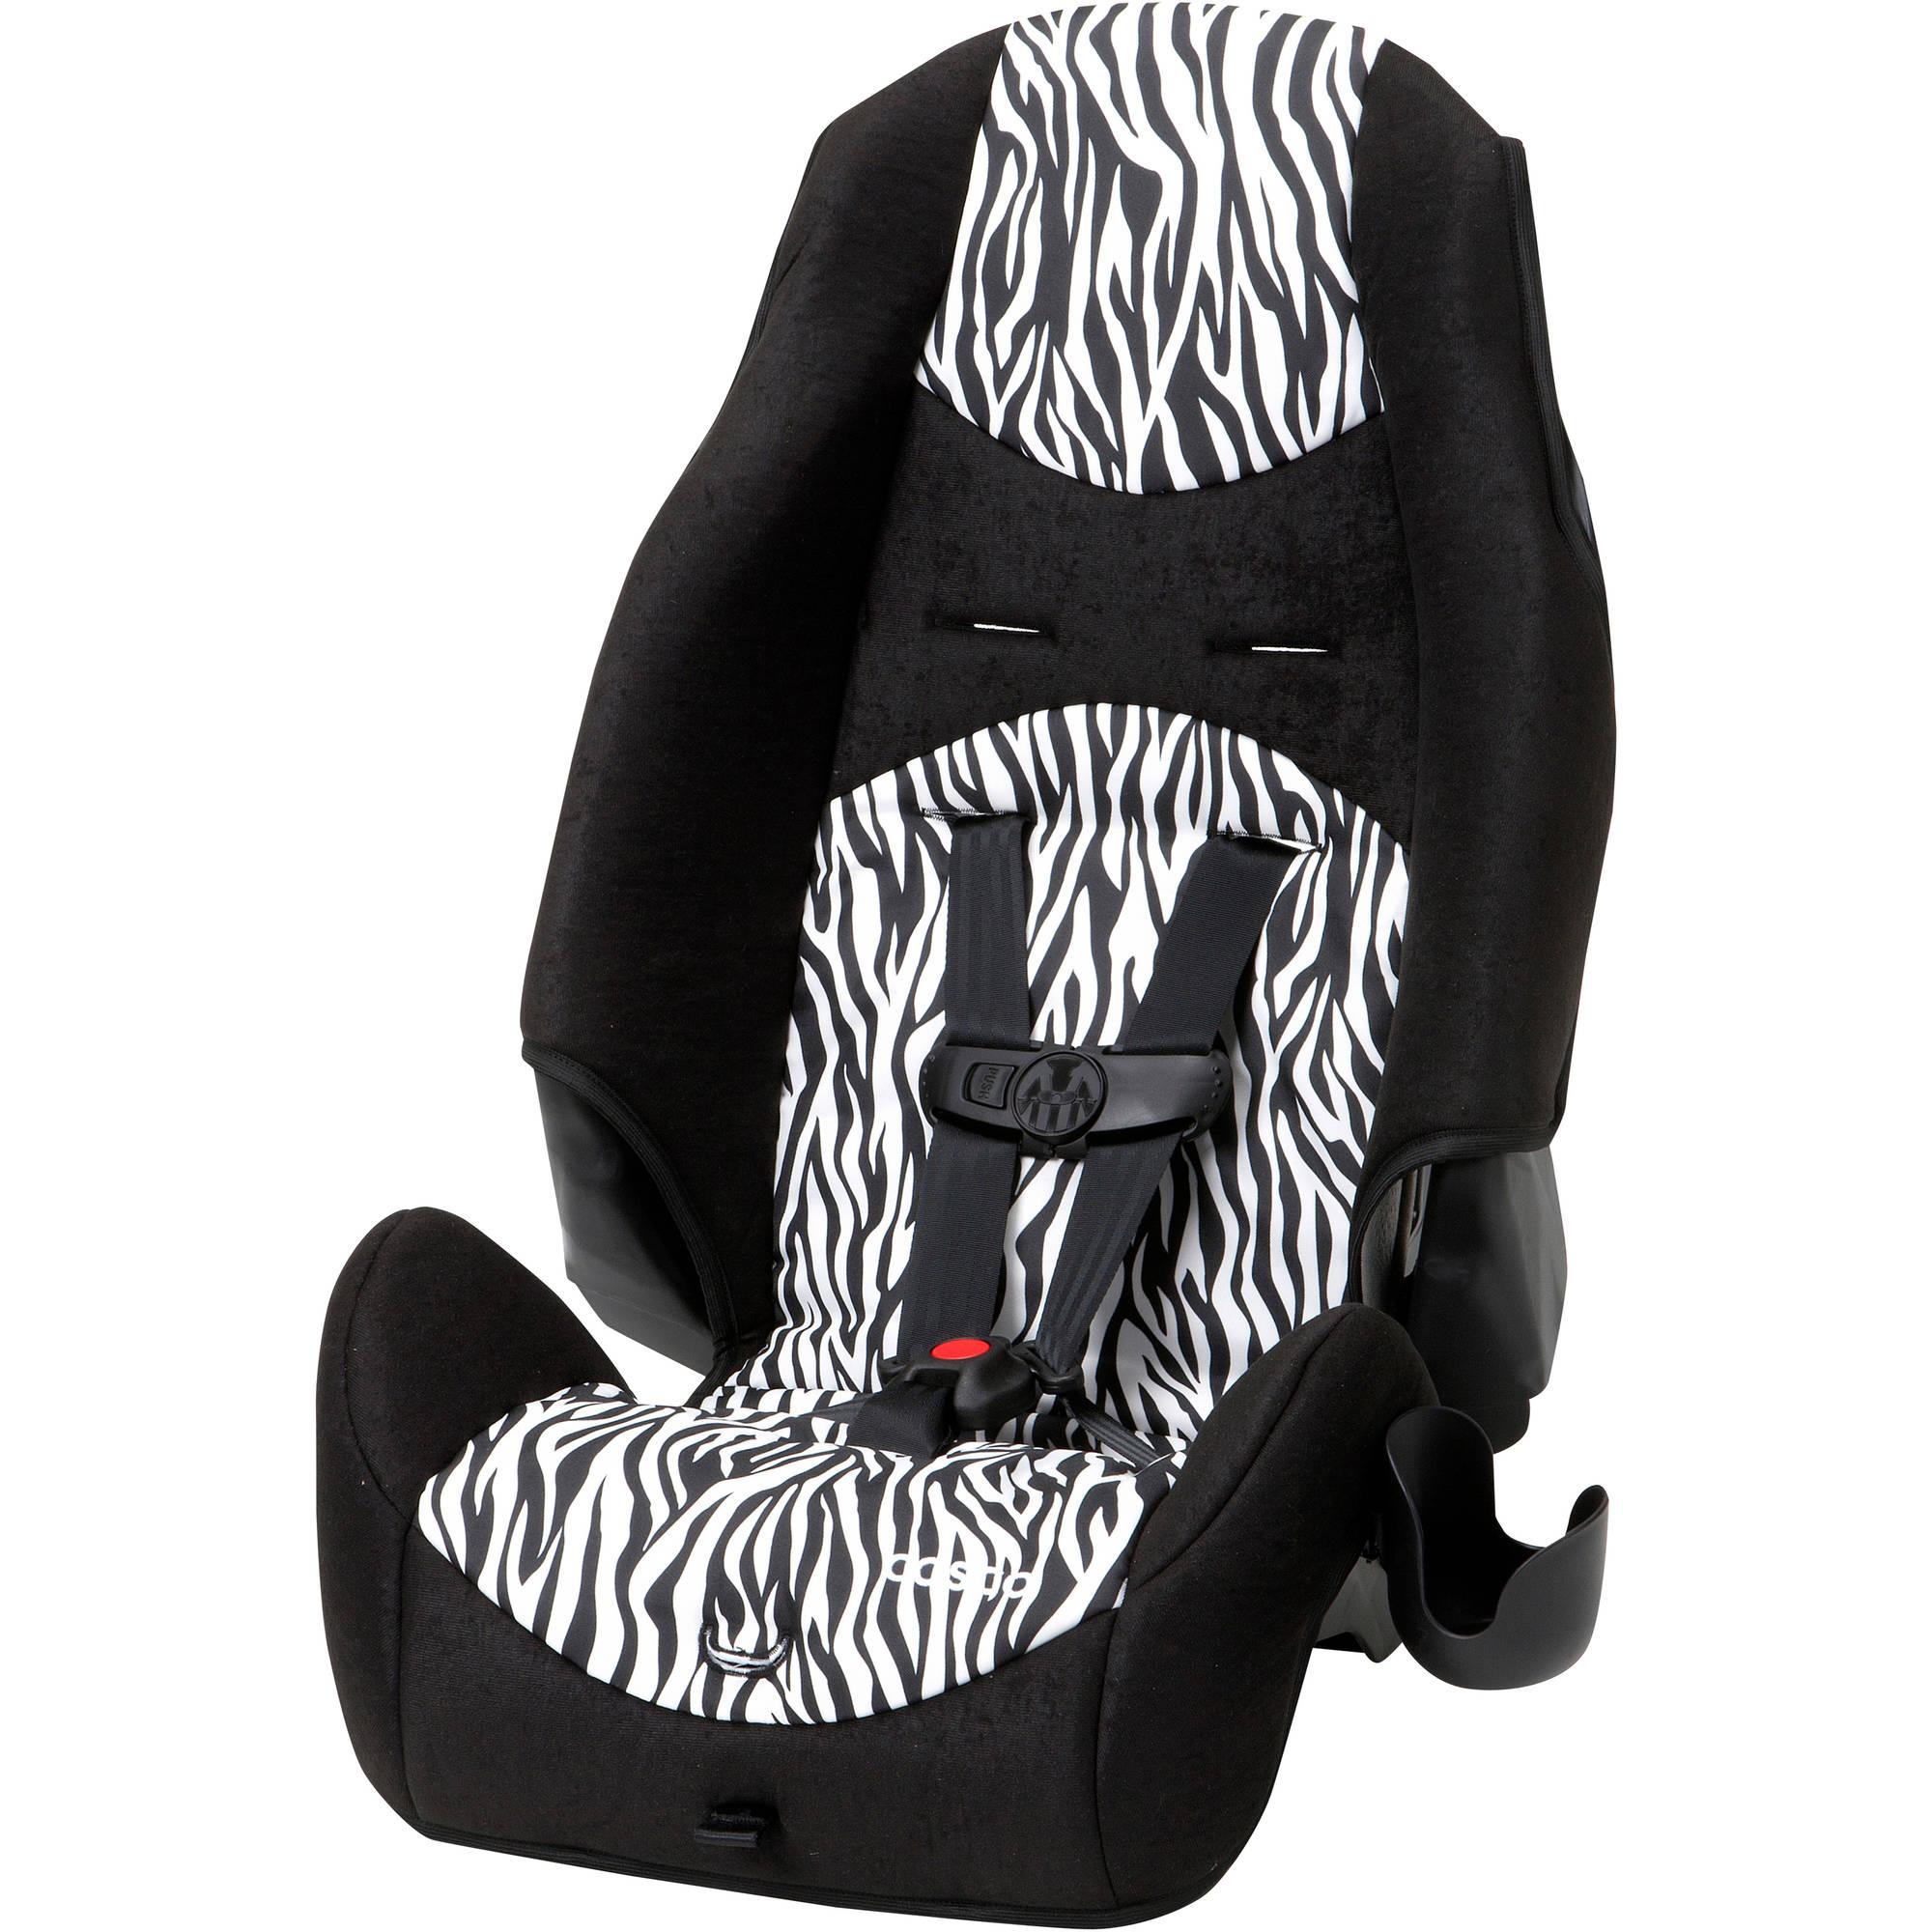 Cosco Highback 2-in-1 Booster Car Seat, Zahari